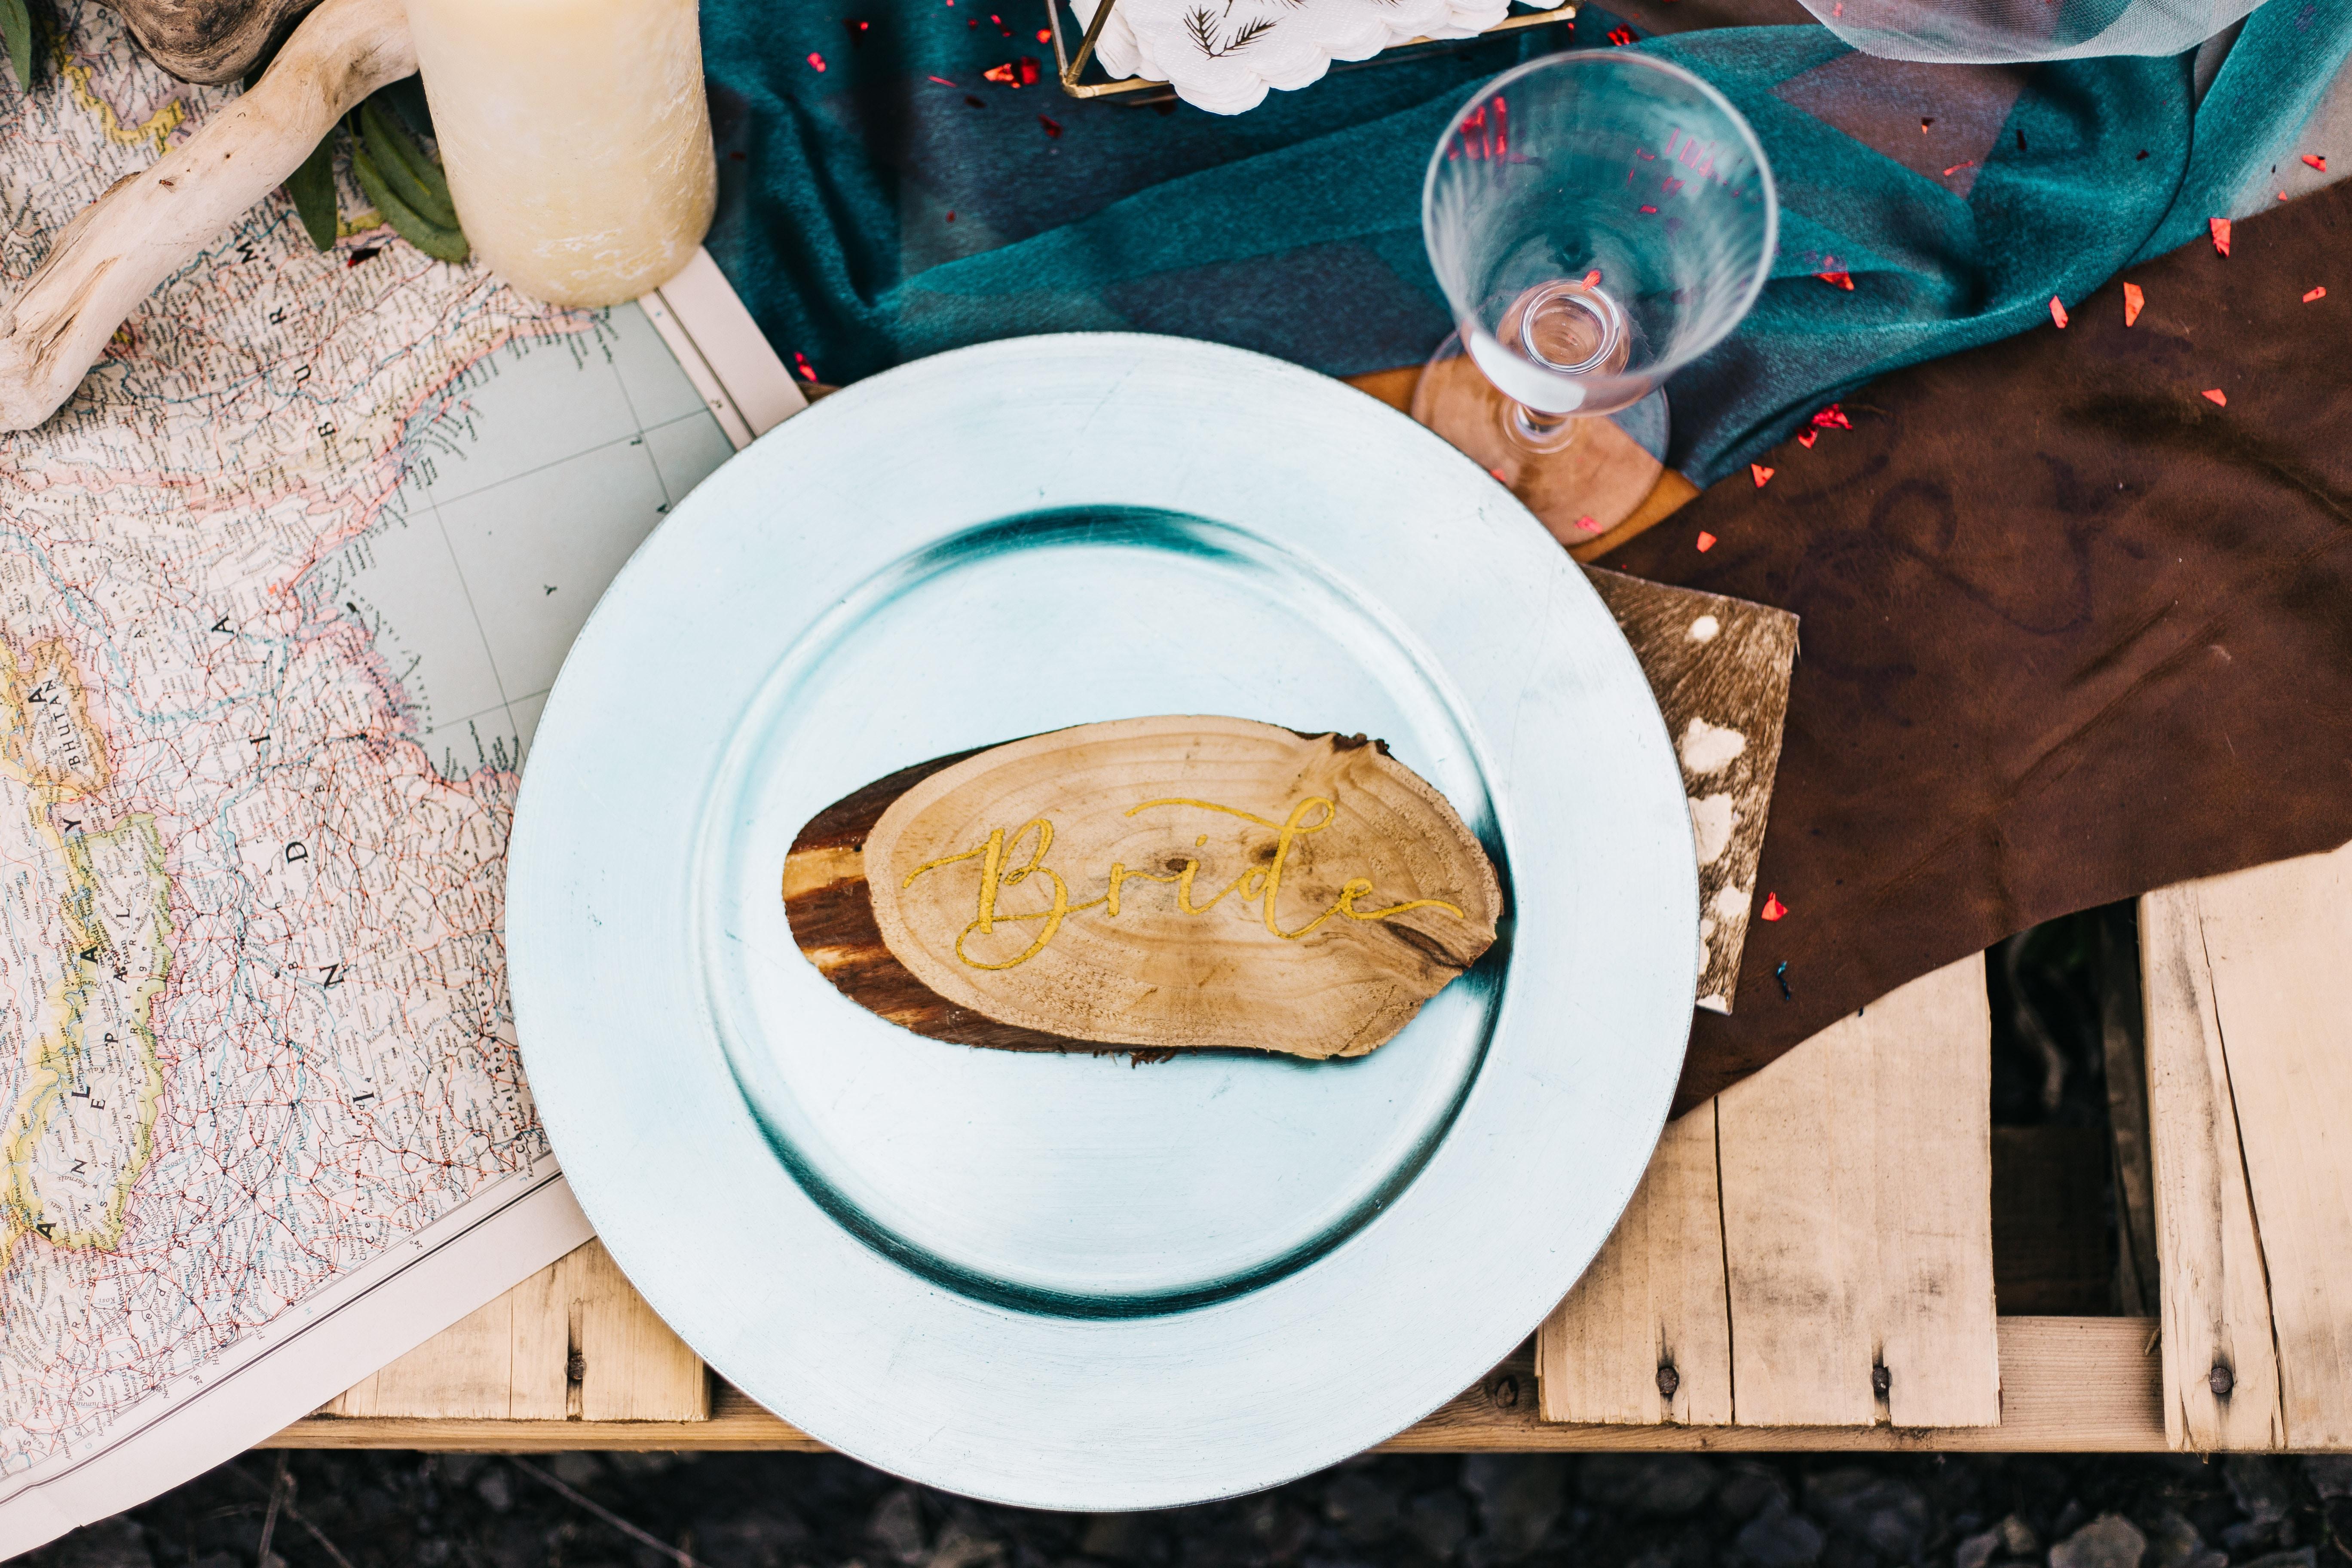 round white ceramic plate